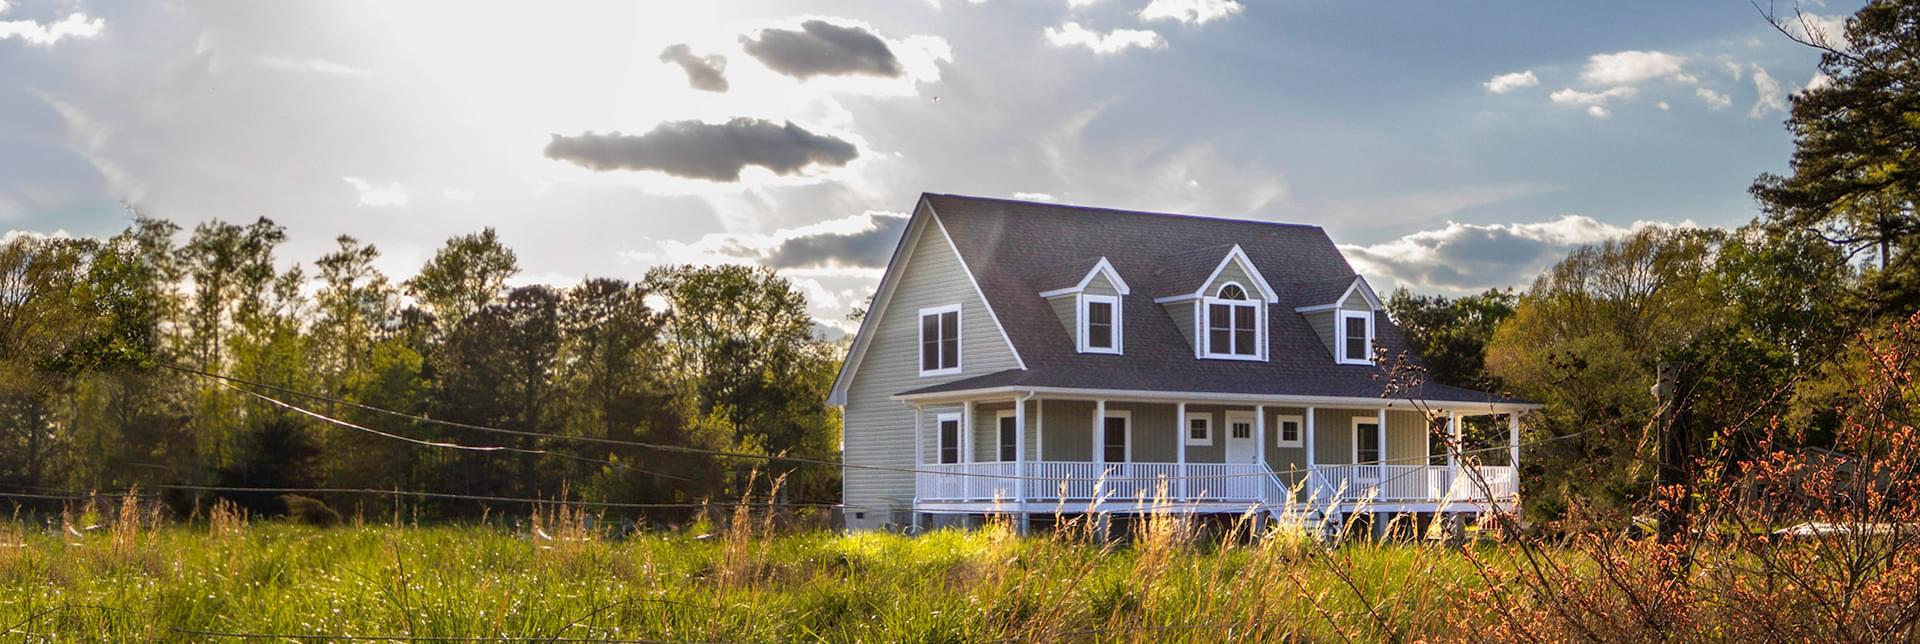 New Homes in Greene County VA